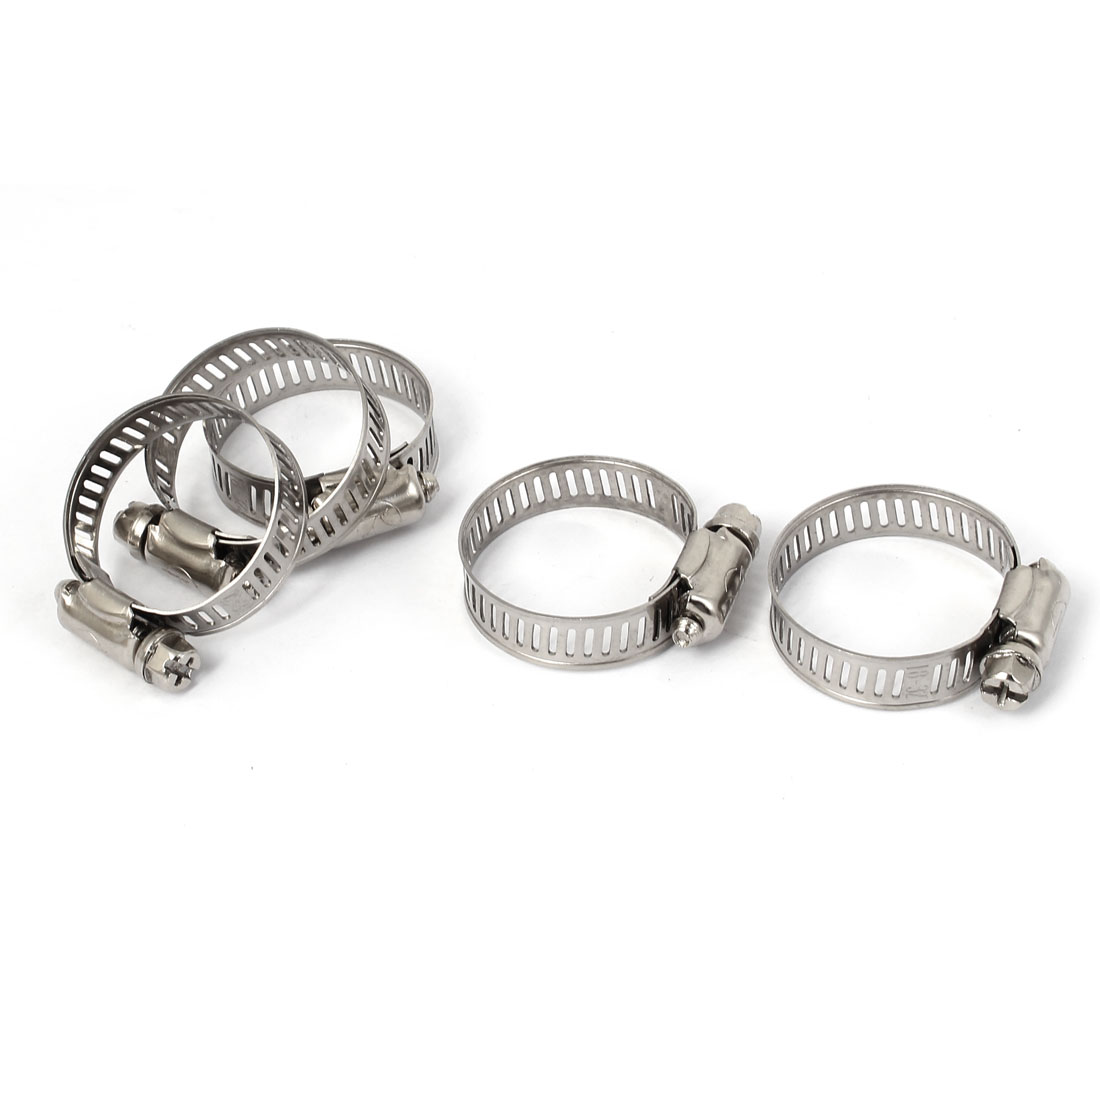 Adjustable 18mm-32mm Range Band Worm Hose Clip Clamp 5 Pcs